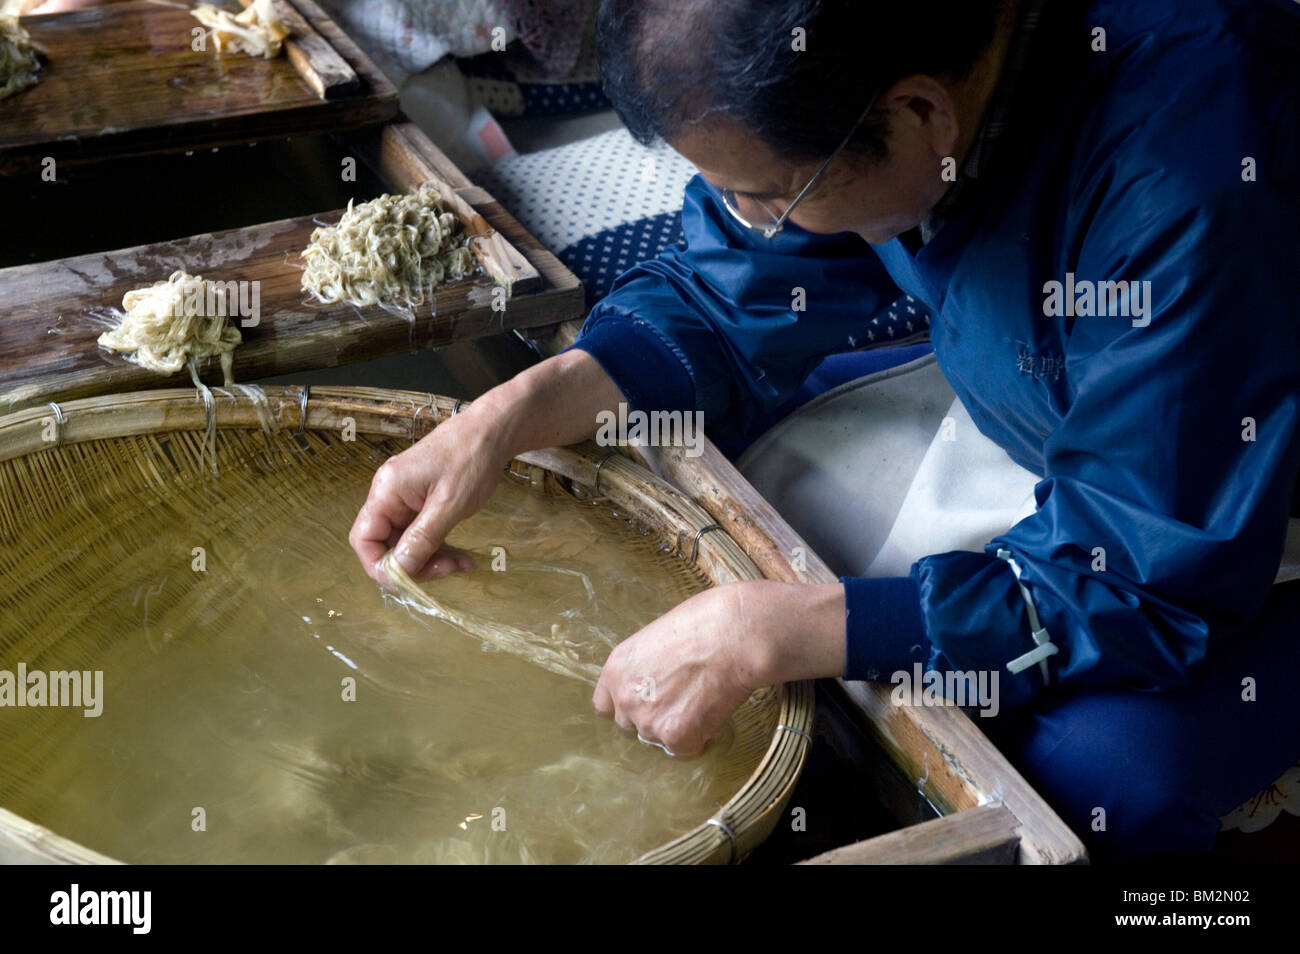 Separating mulberry fibers for making Japanese washi paper at the Echizen Washi No Sato village in Fukui, Japan - Stock Image